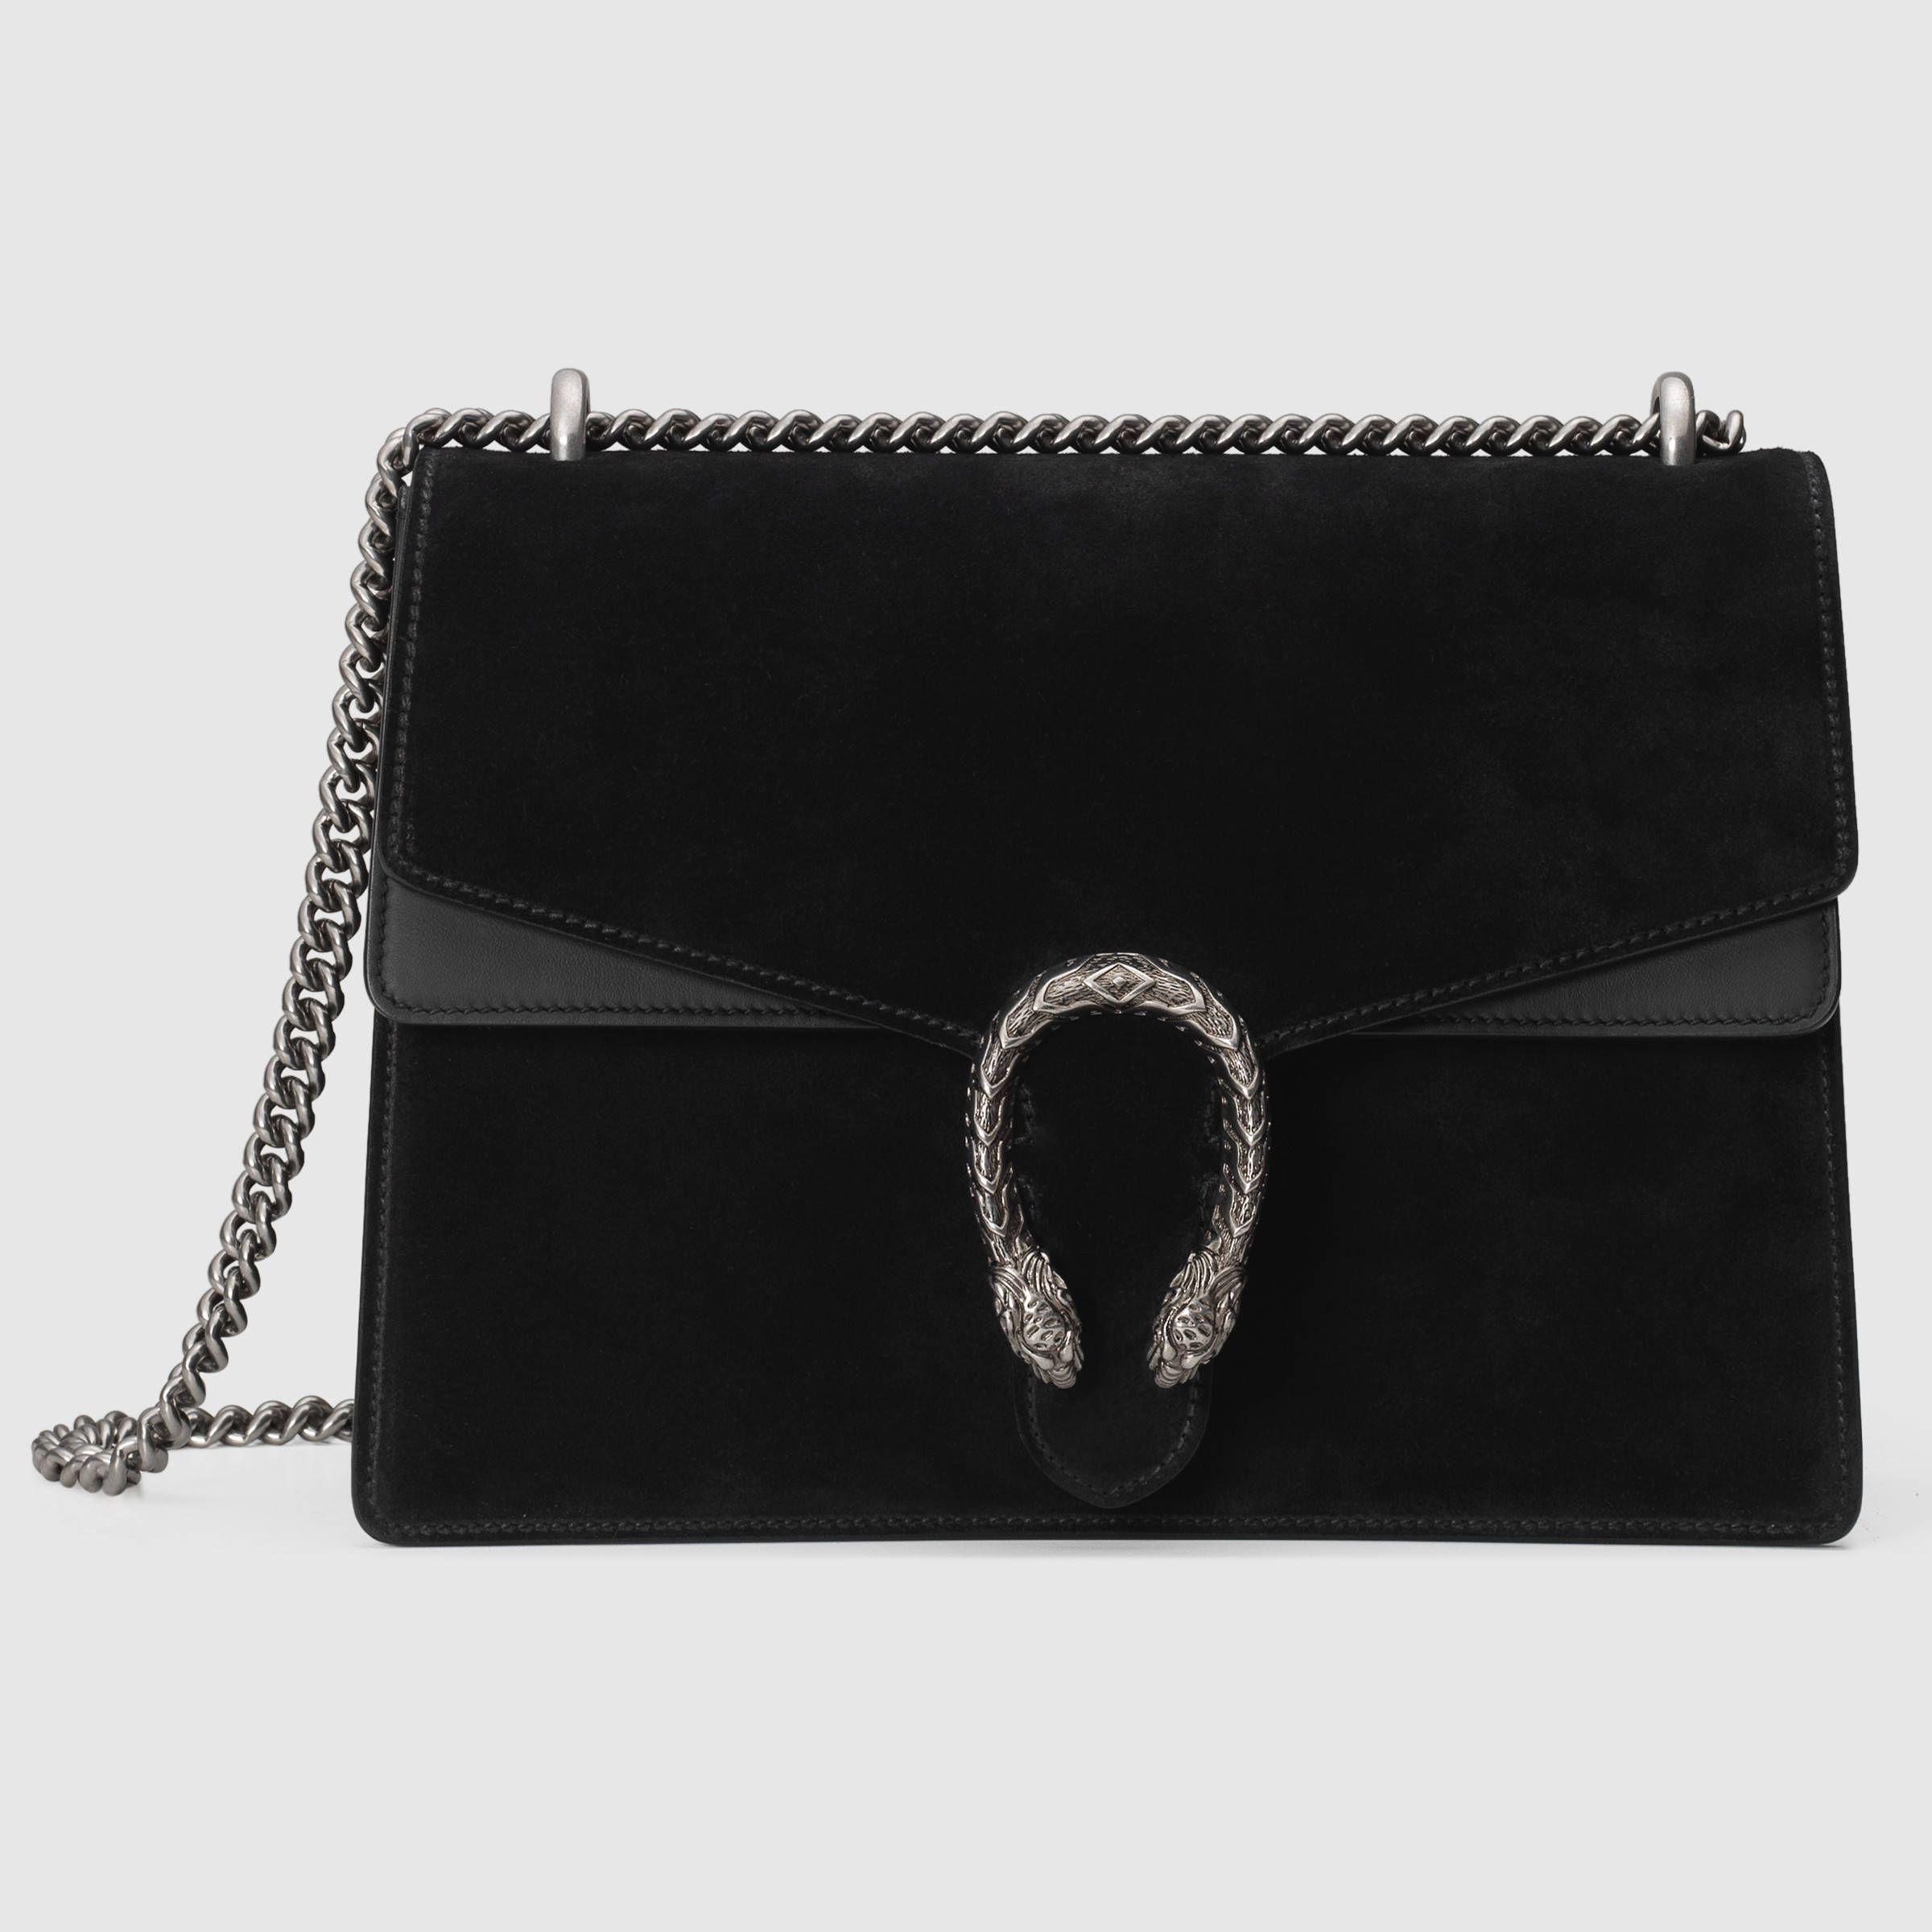 07d6d5a03ddf35 Dionysus suede shoulder bag in 2019 | Style | Gucci dyonisus bag ...